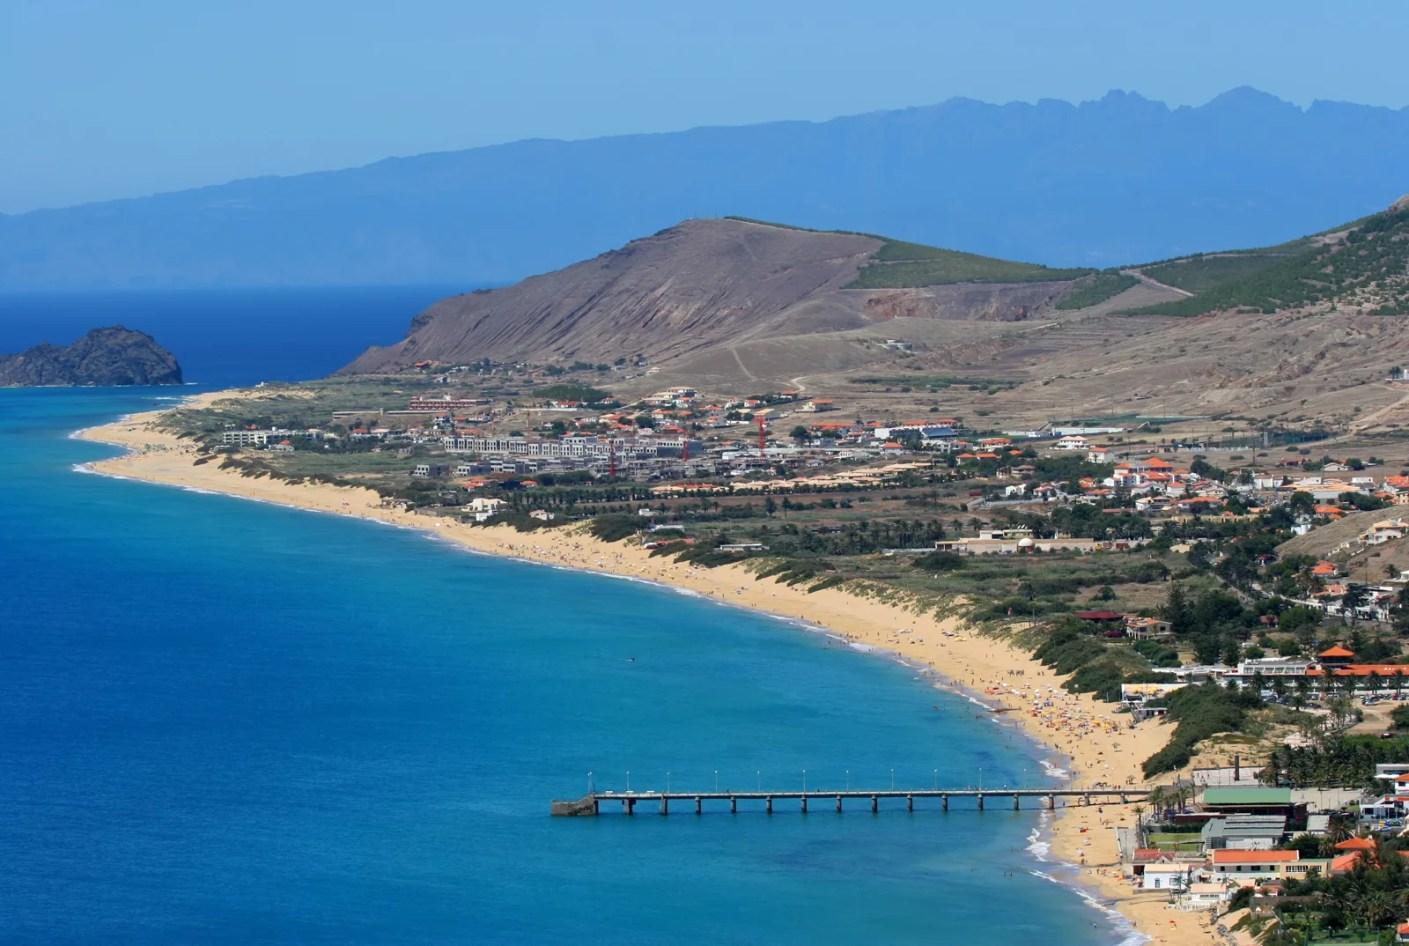 Porto Santo Beach. (Photo by Francisco Amaral Leitao / Shutterstock)